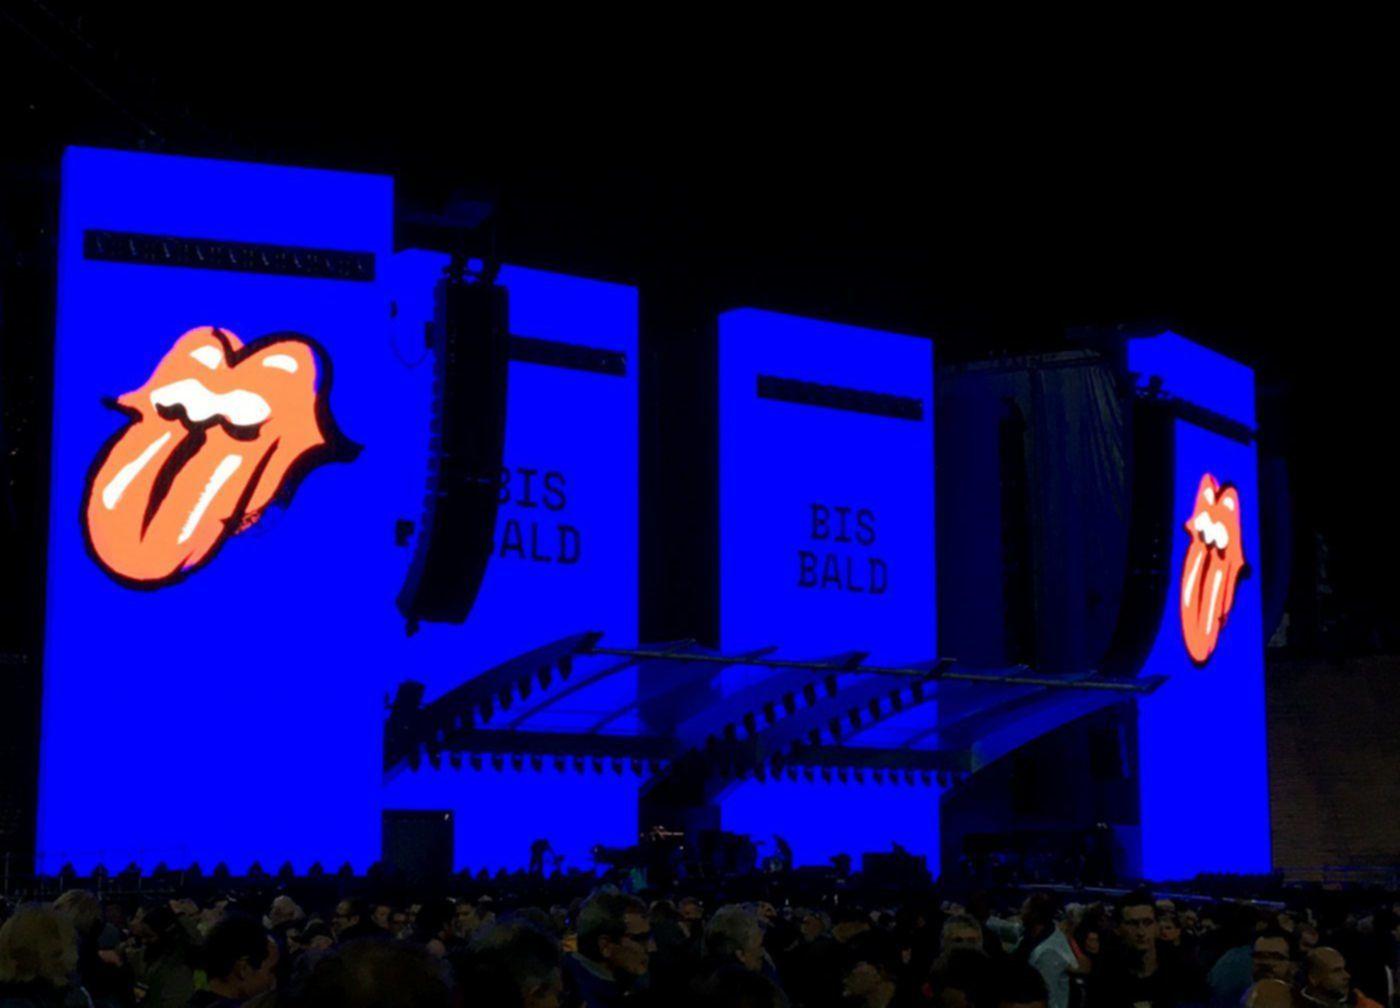 64 Rolling Stones M++nchen (Handy) -® Frank Witzelmaier